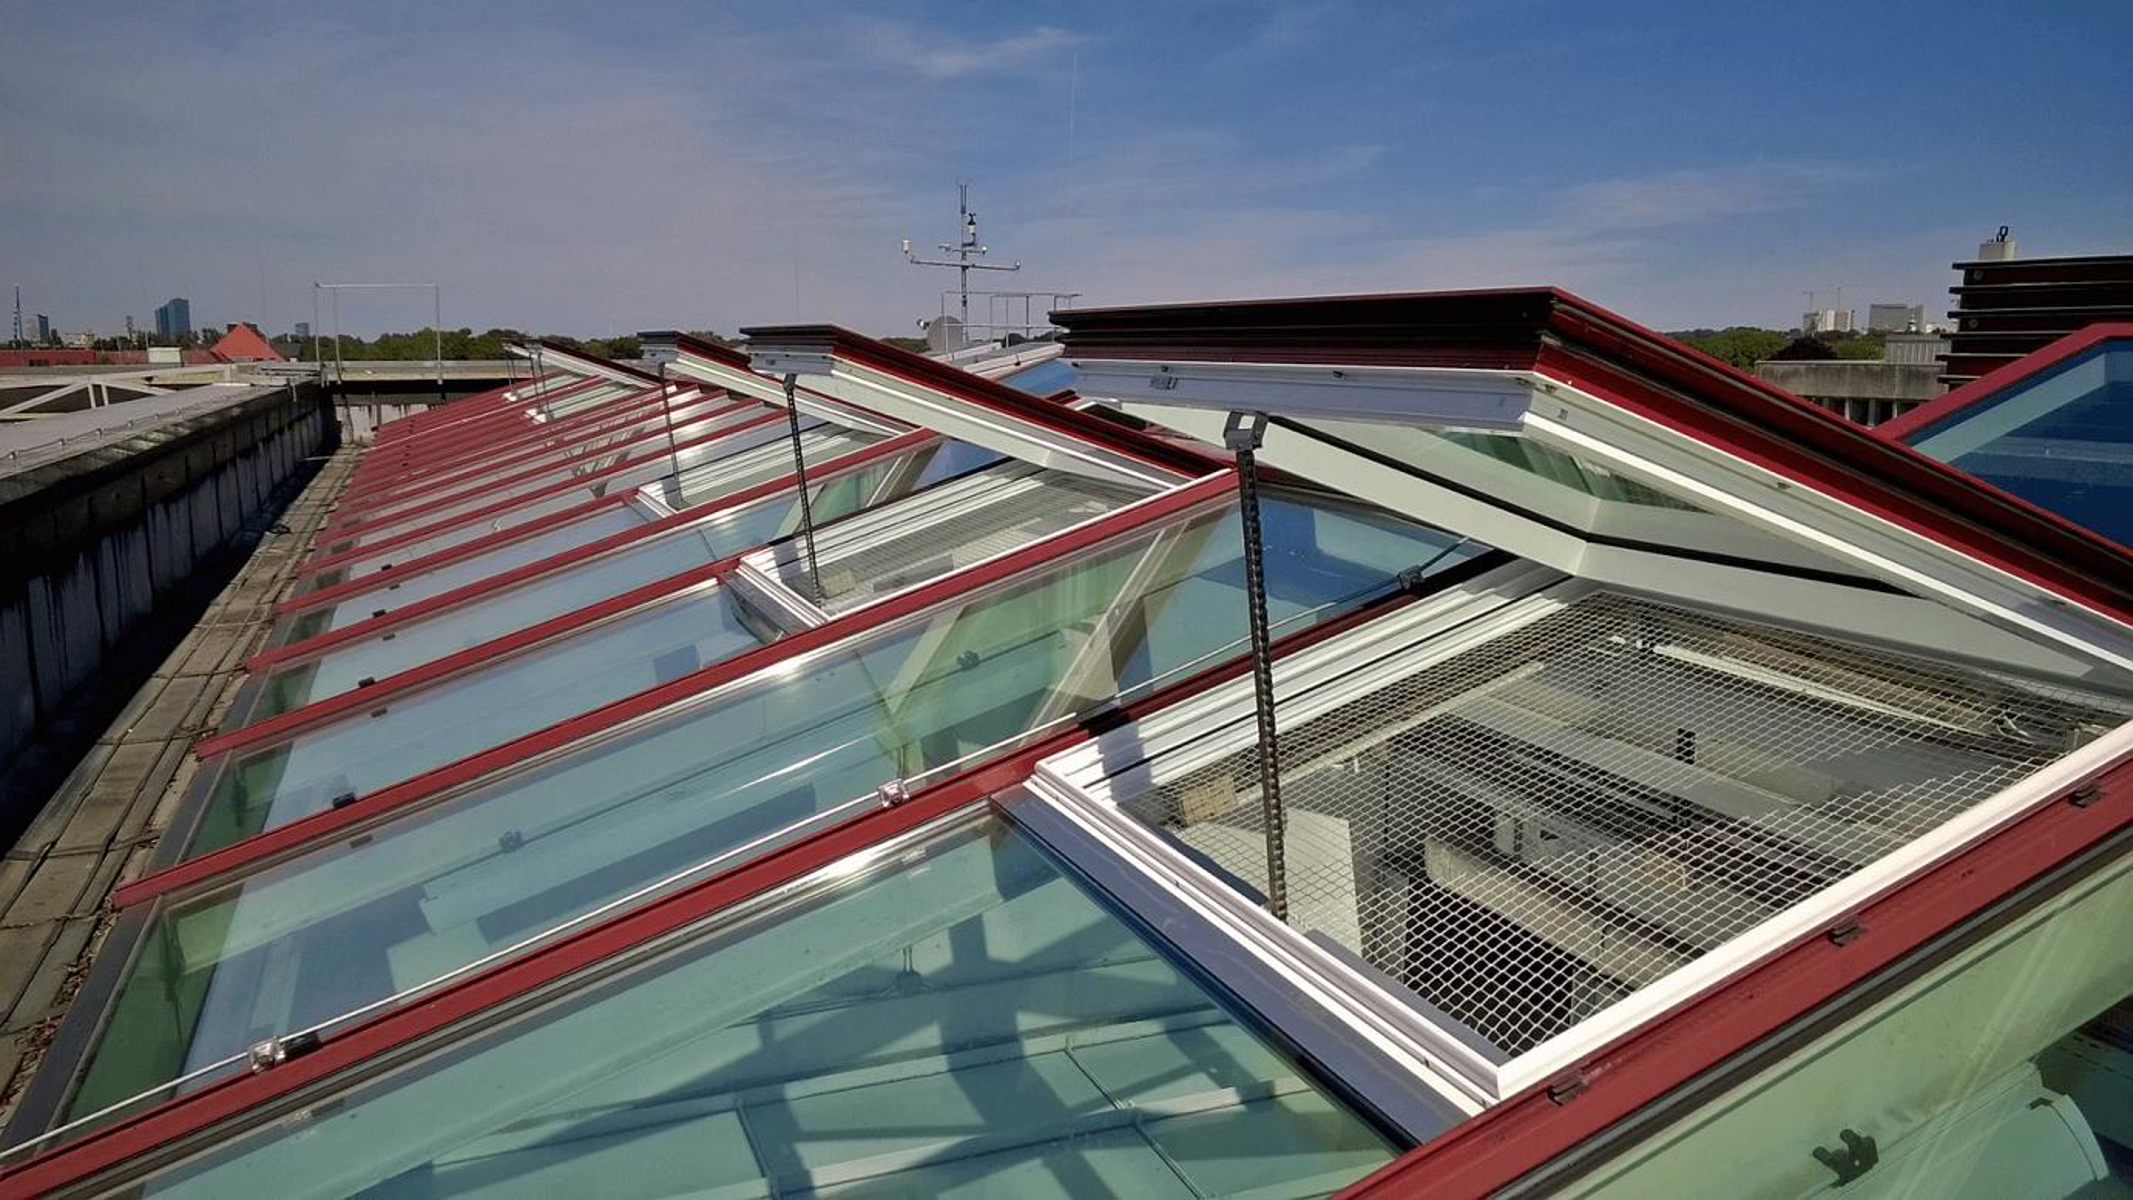 Kettenantrieb Dachfenster